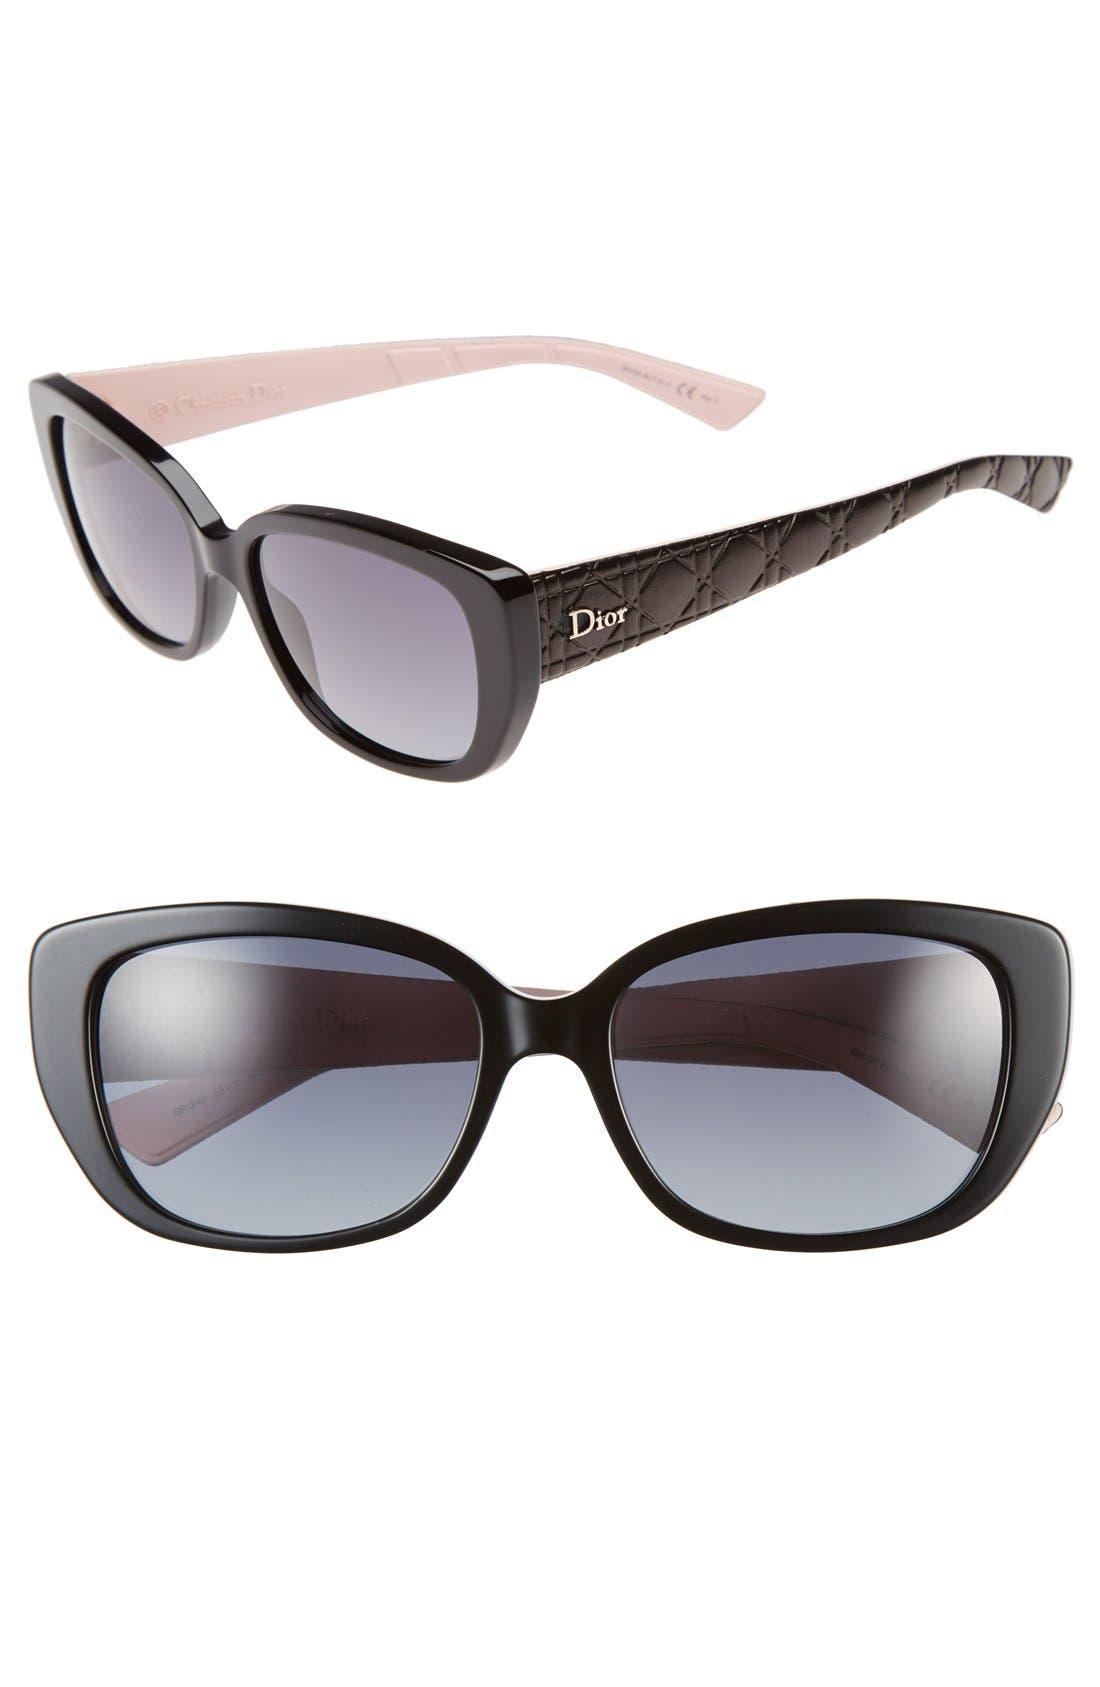 Main Image - Dior Lady 55mm Cat Eye Sunglasses